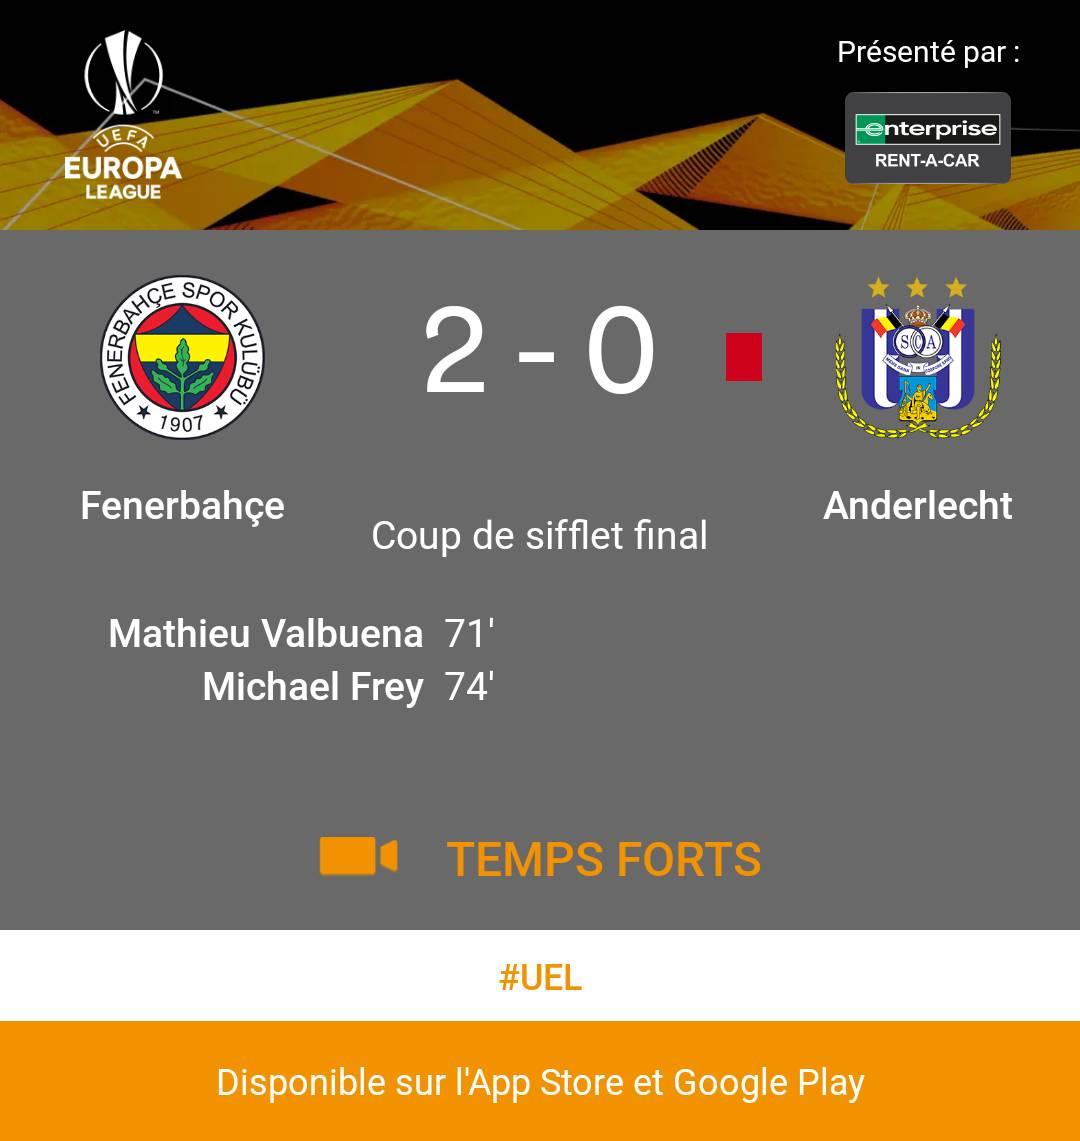 Fenerbahçe  -  Anderlecht https://t.co/JF4KUSeI8U #fenand https://t.co/DqXDMOU68e